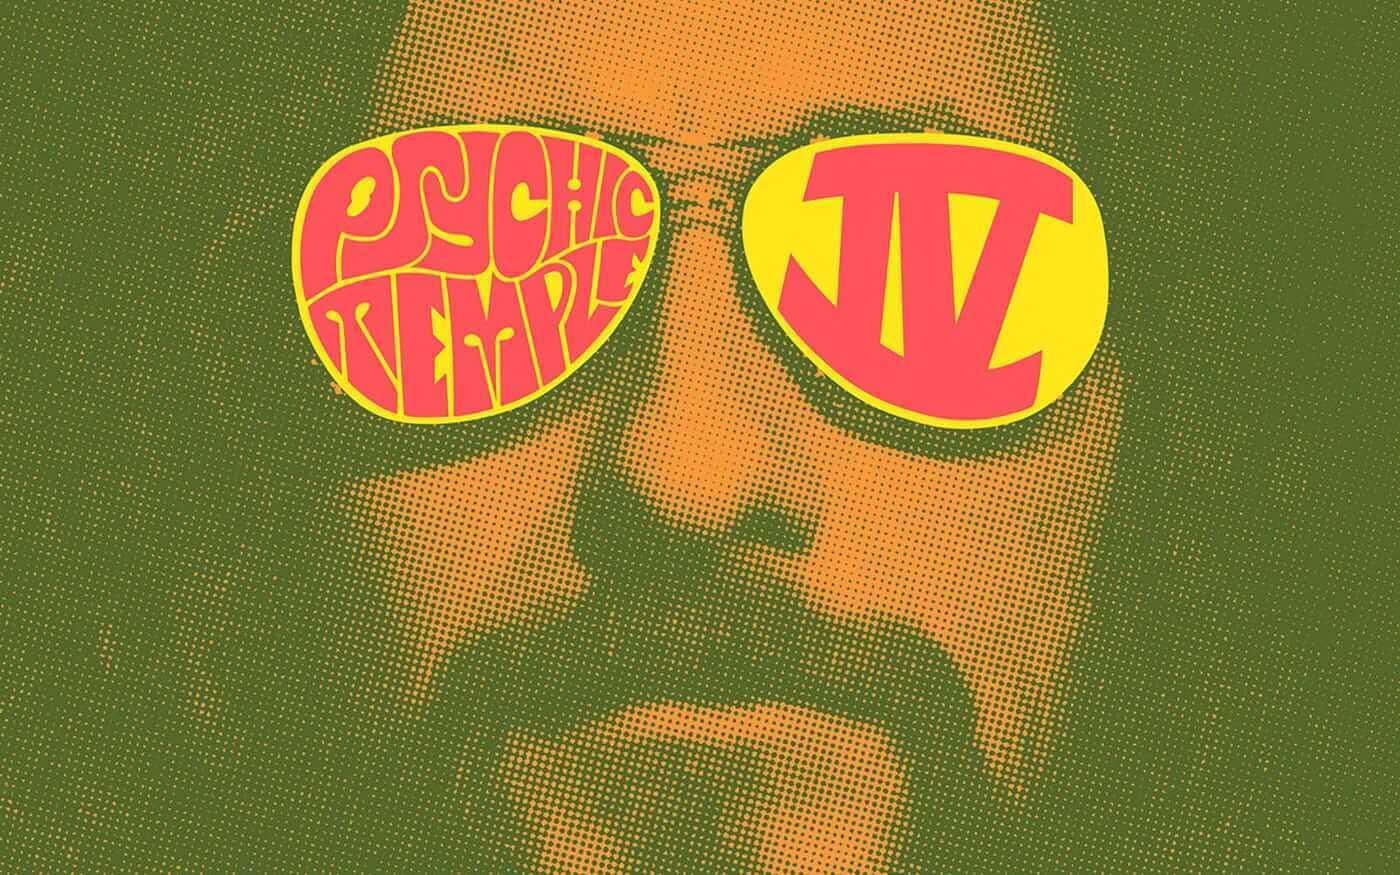 Psychic Temple's Chris Schlarb